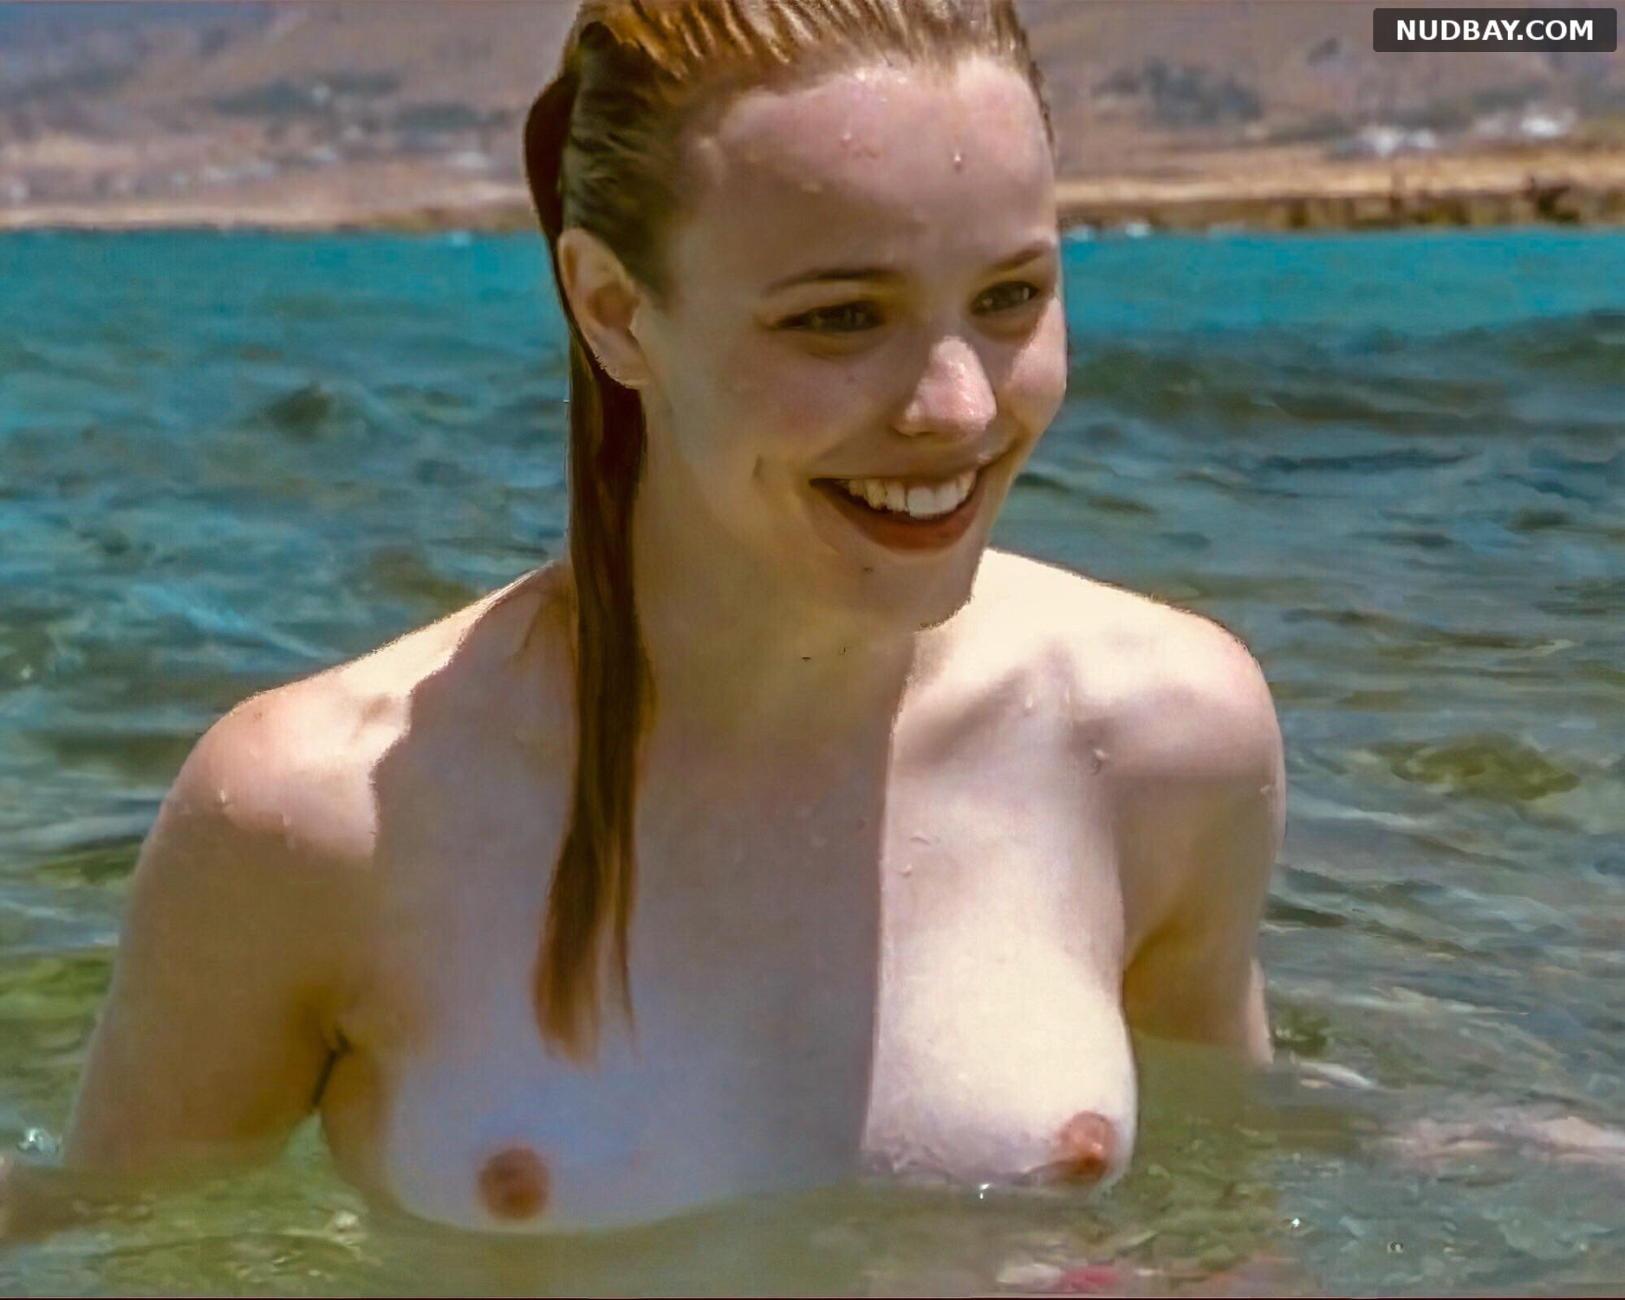 Rachel McAdams nude My Name Is Tanino (2002)